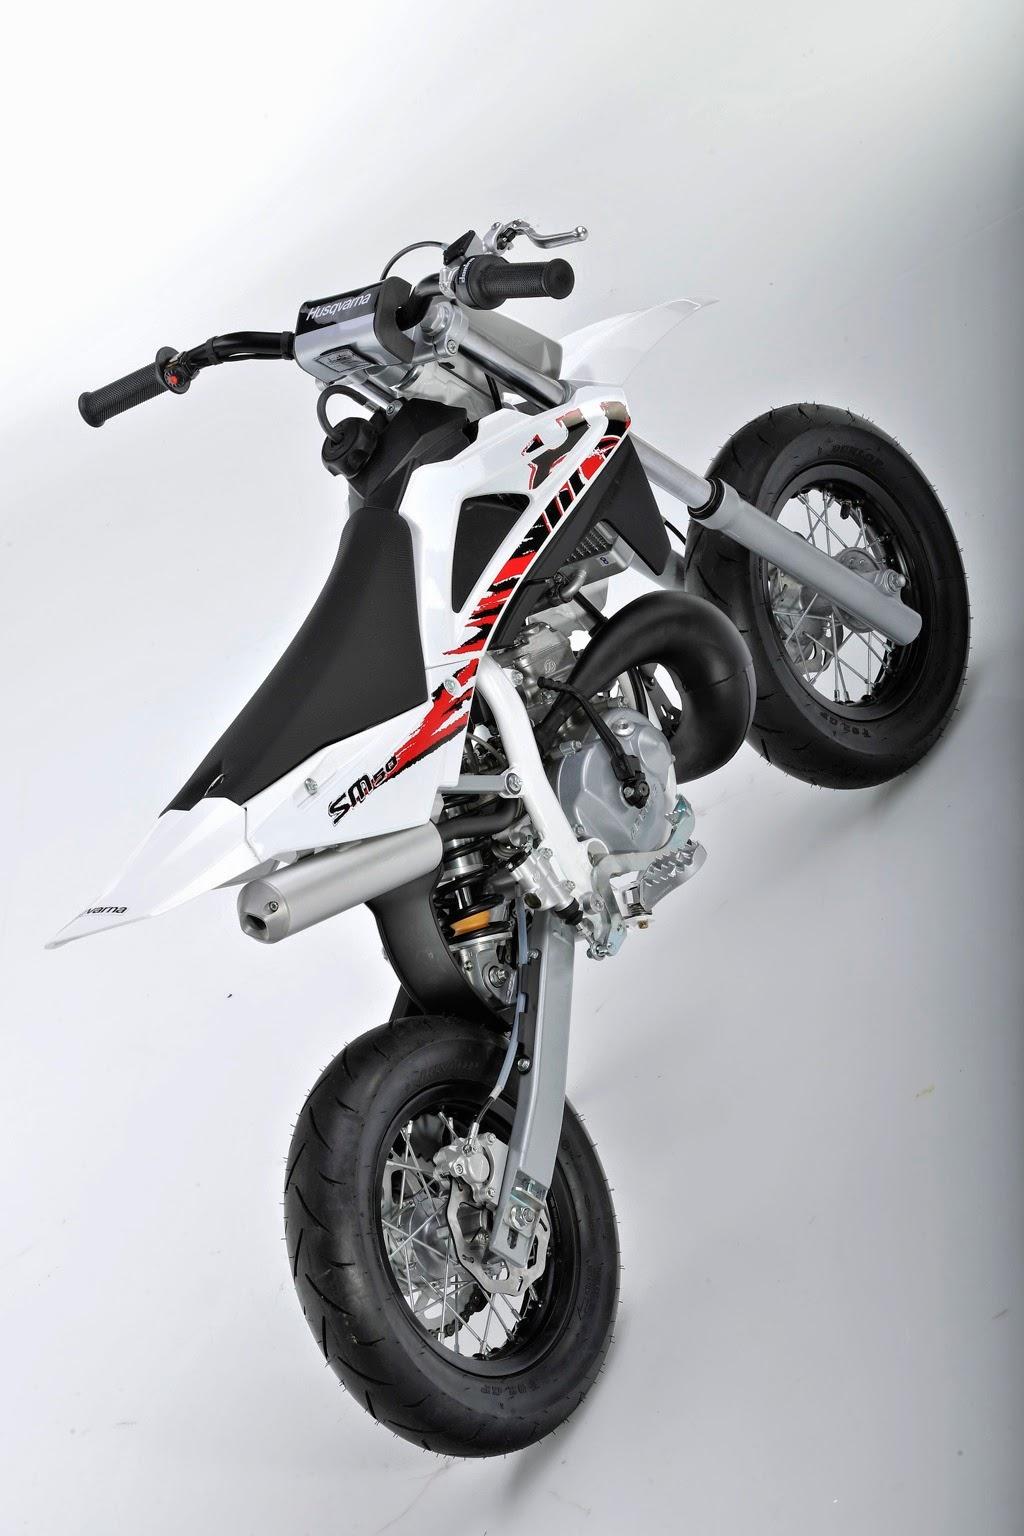 Husqvarna SM50 White Motorcycles HD Wallpapers